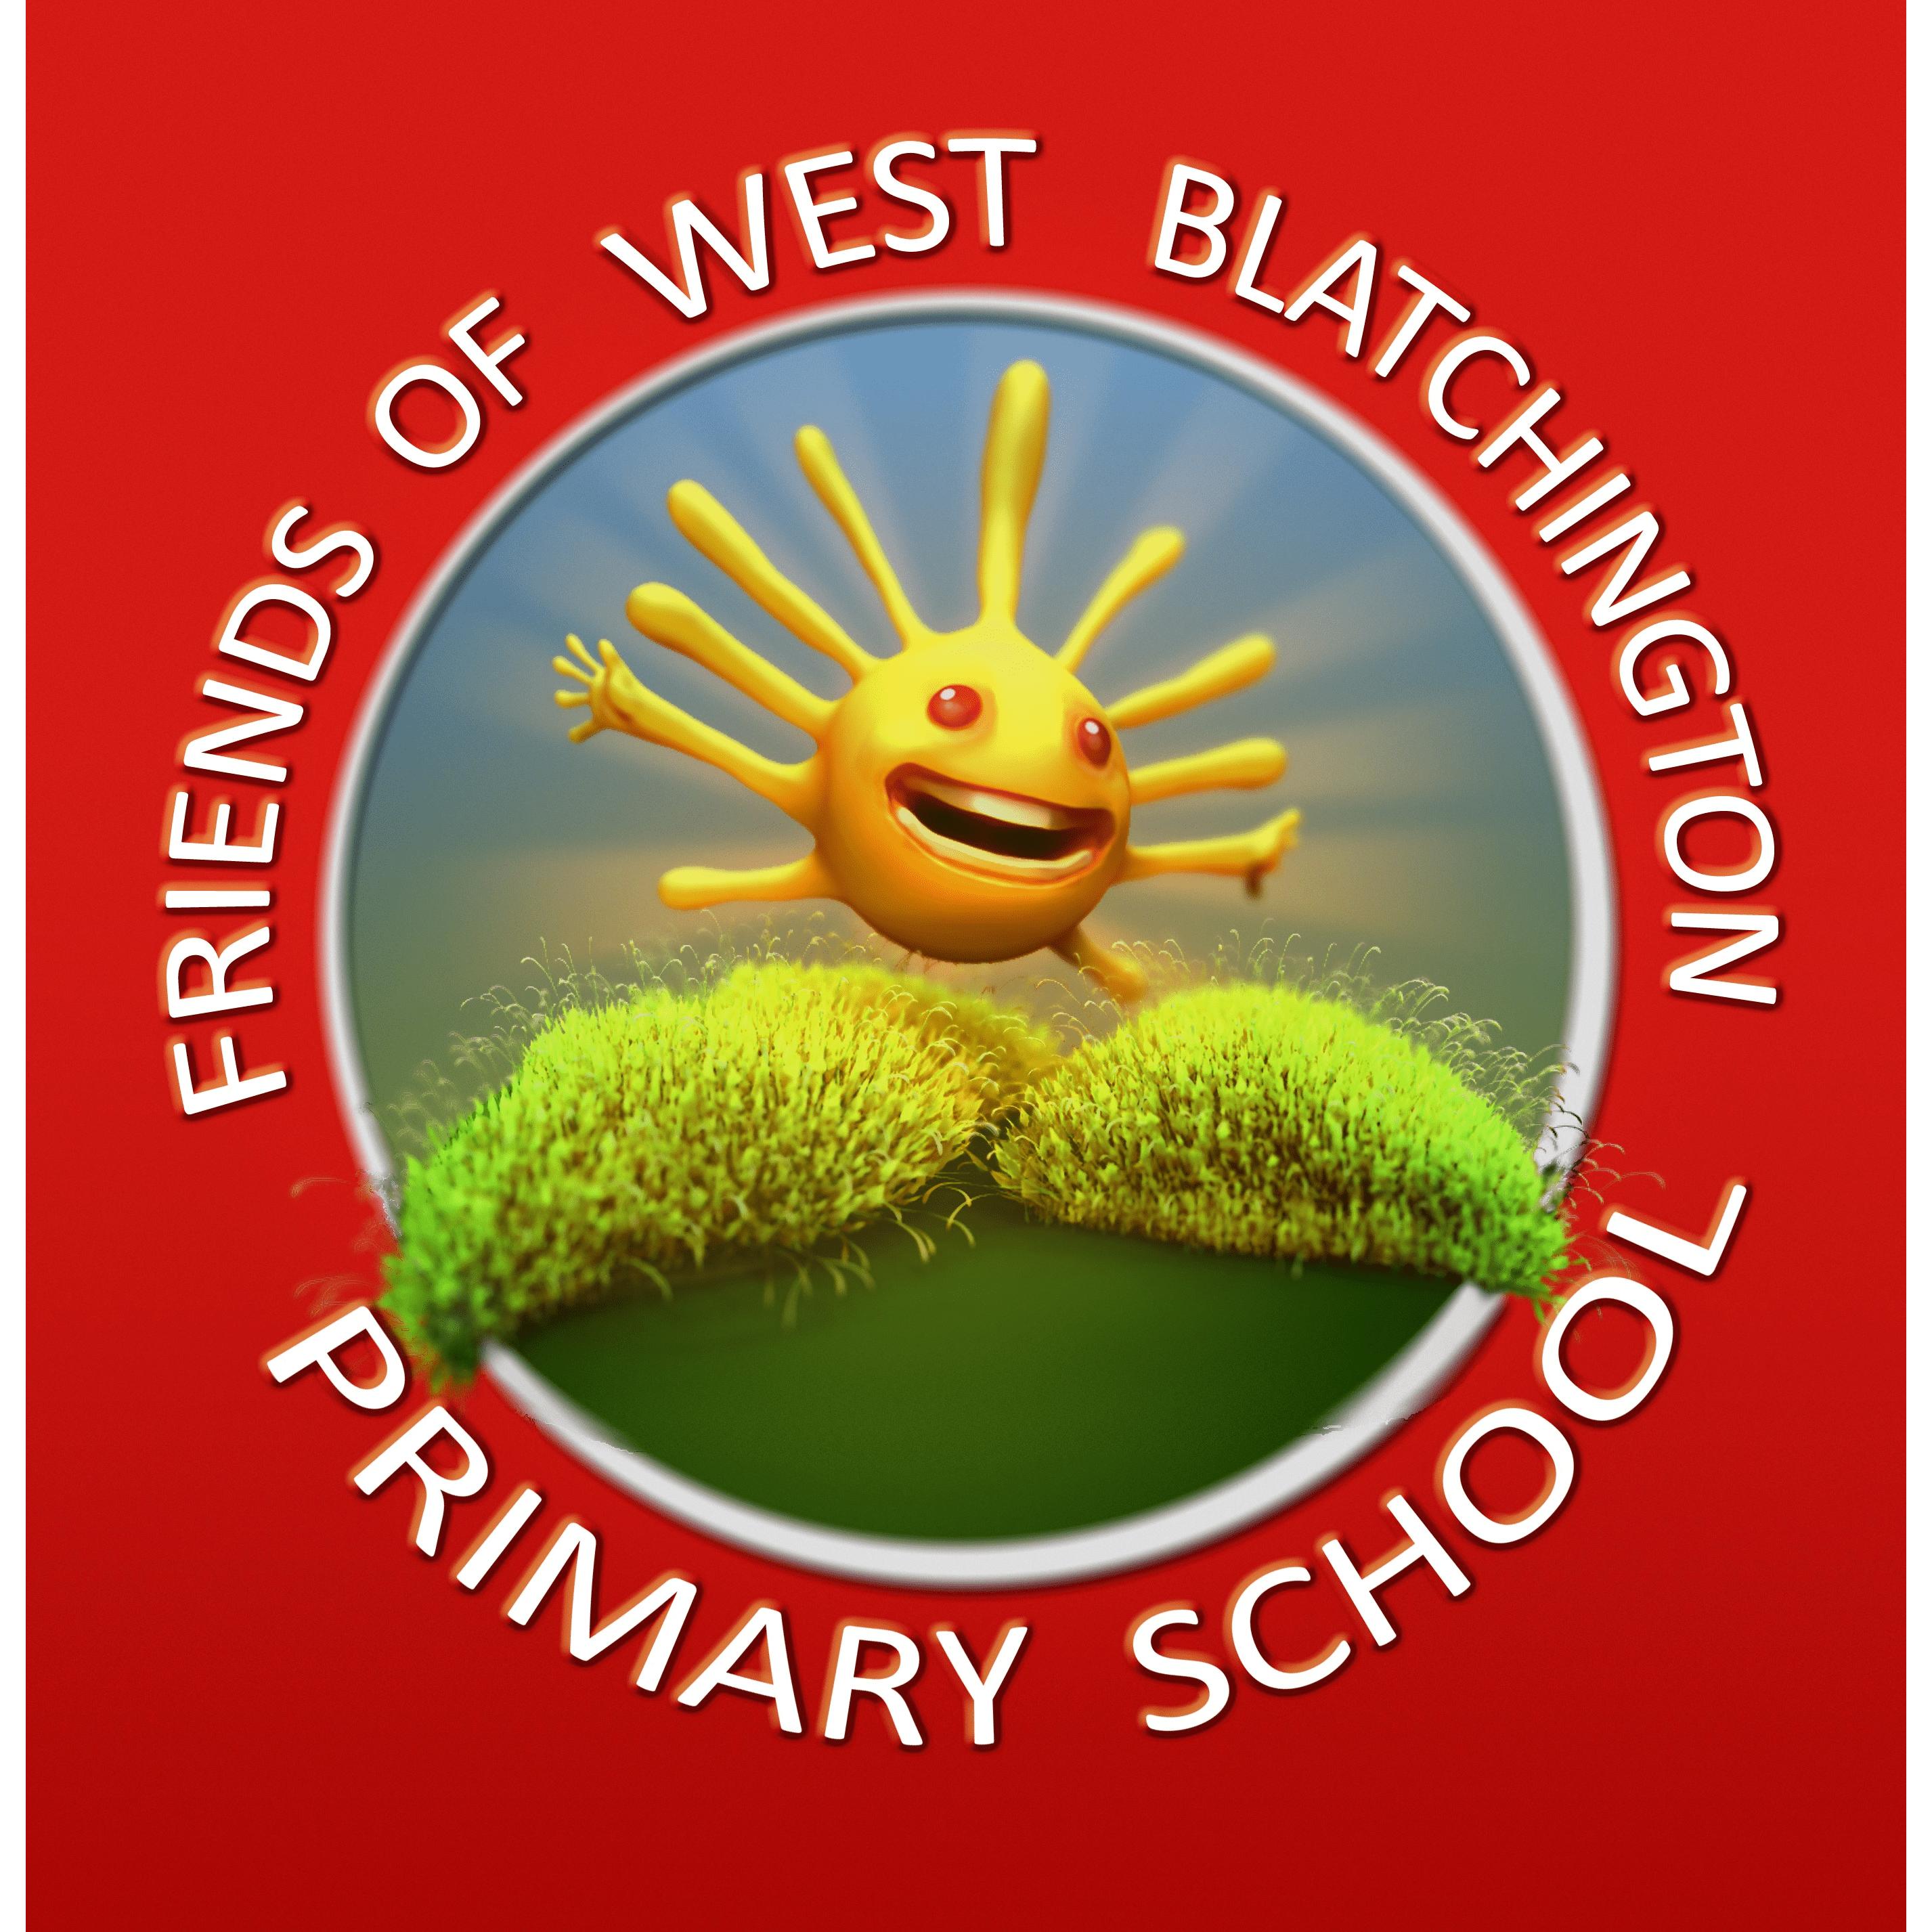 Friends of West Blatchington Primary School - Hove